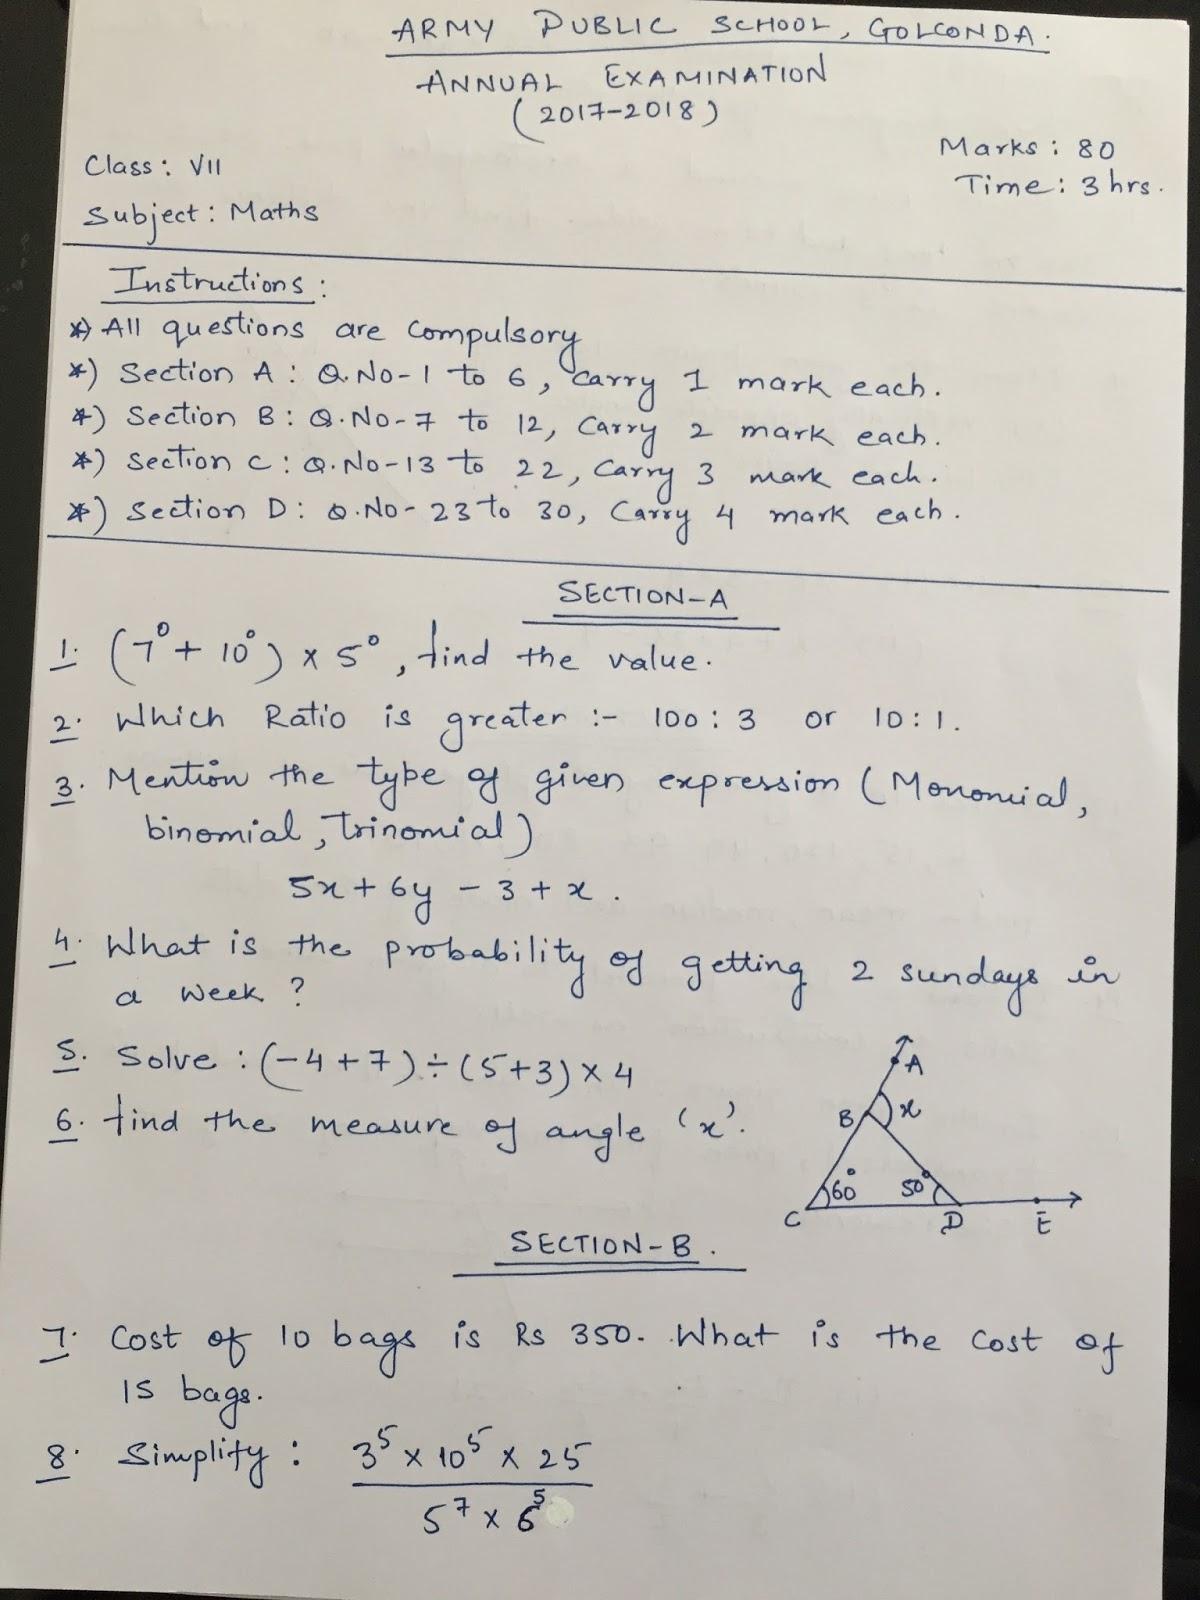 Apsg Class 7 Model Annual Exam Question Paper